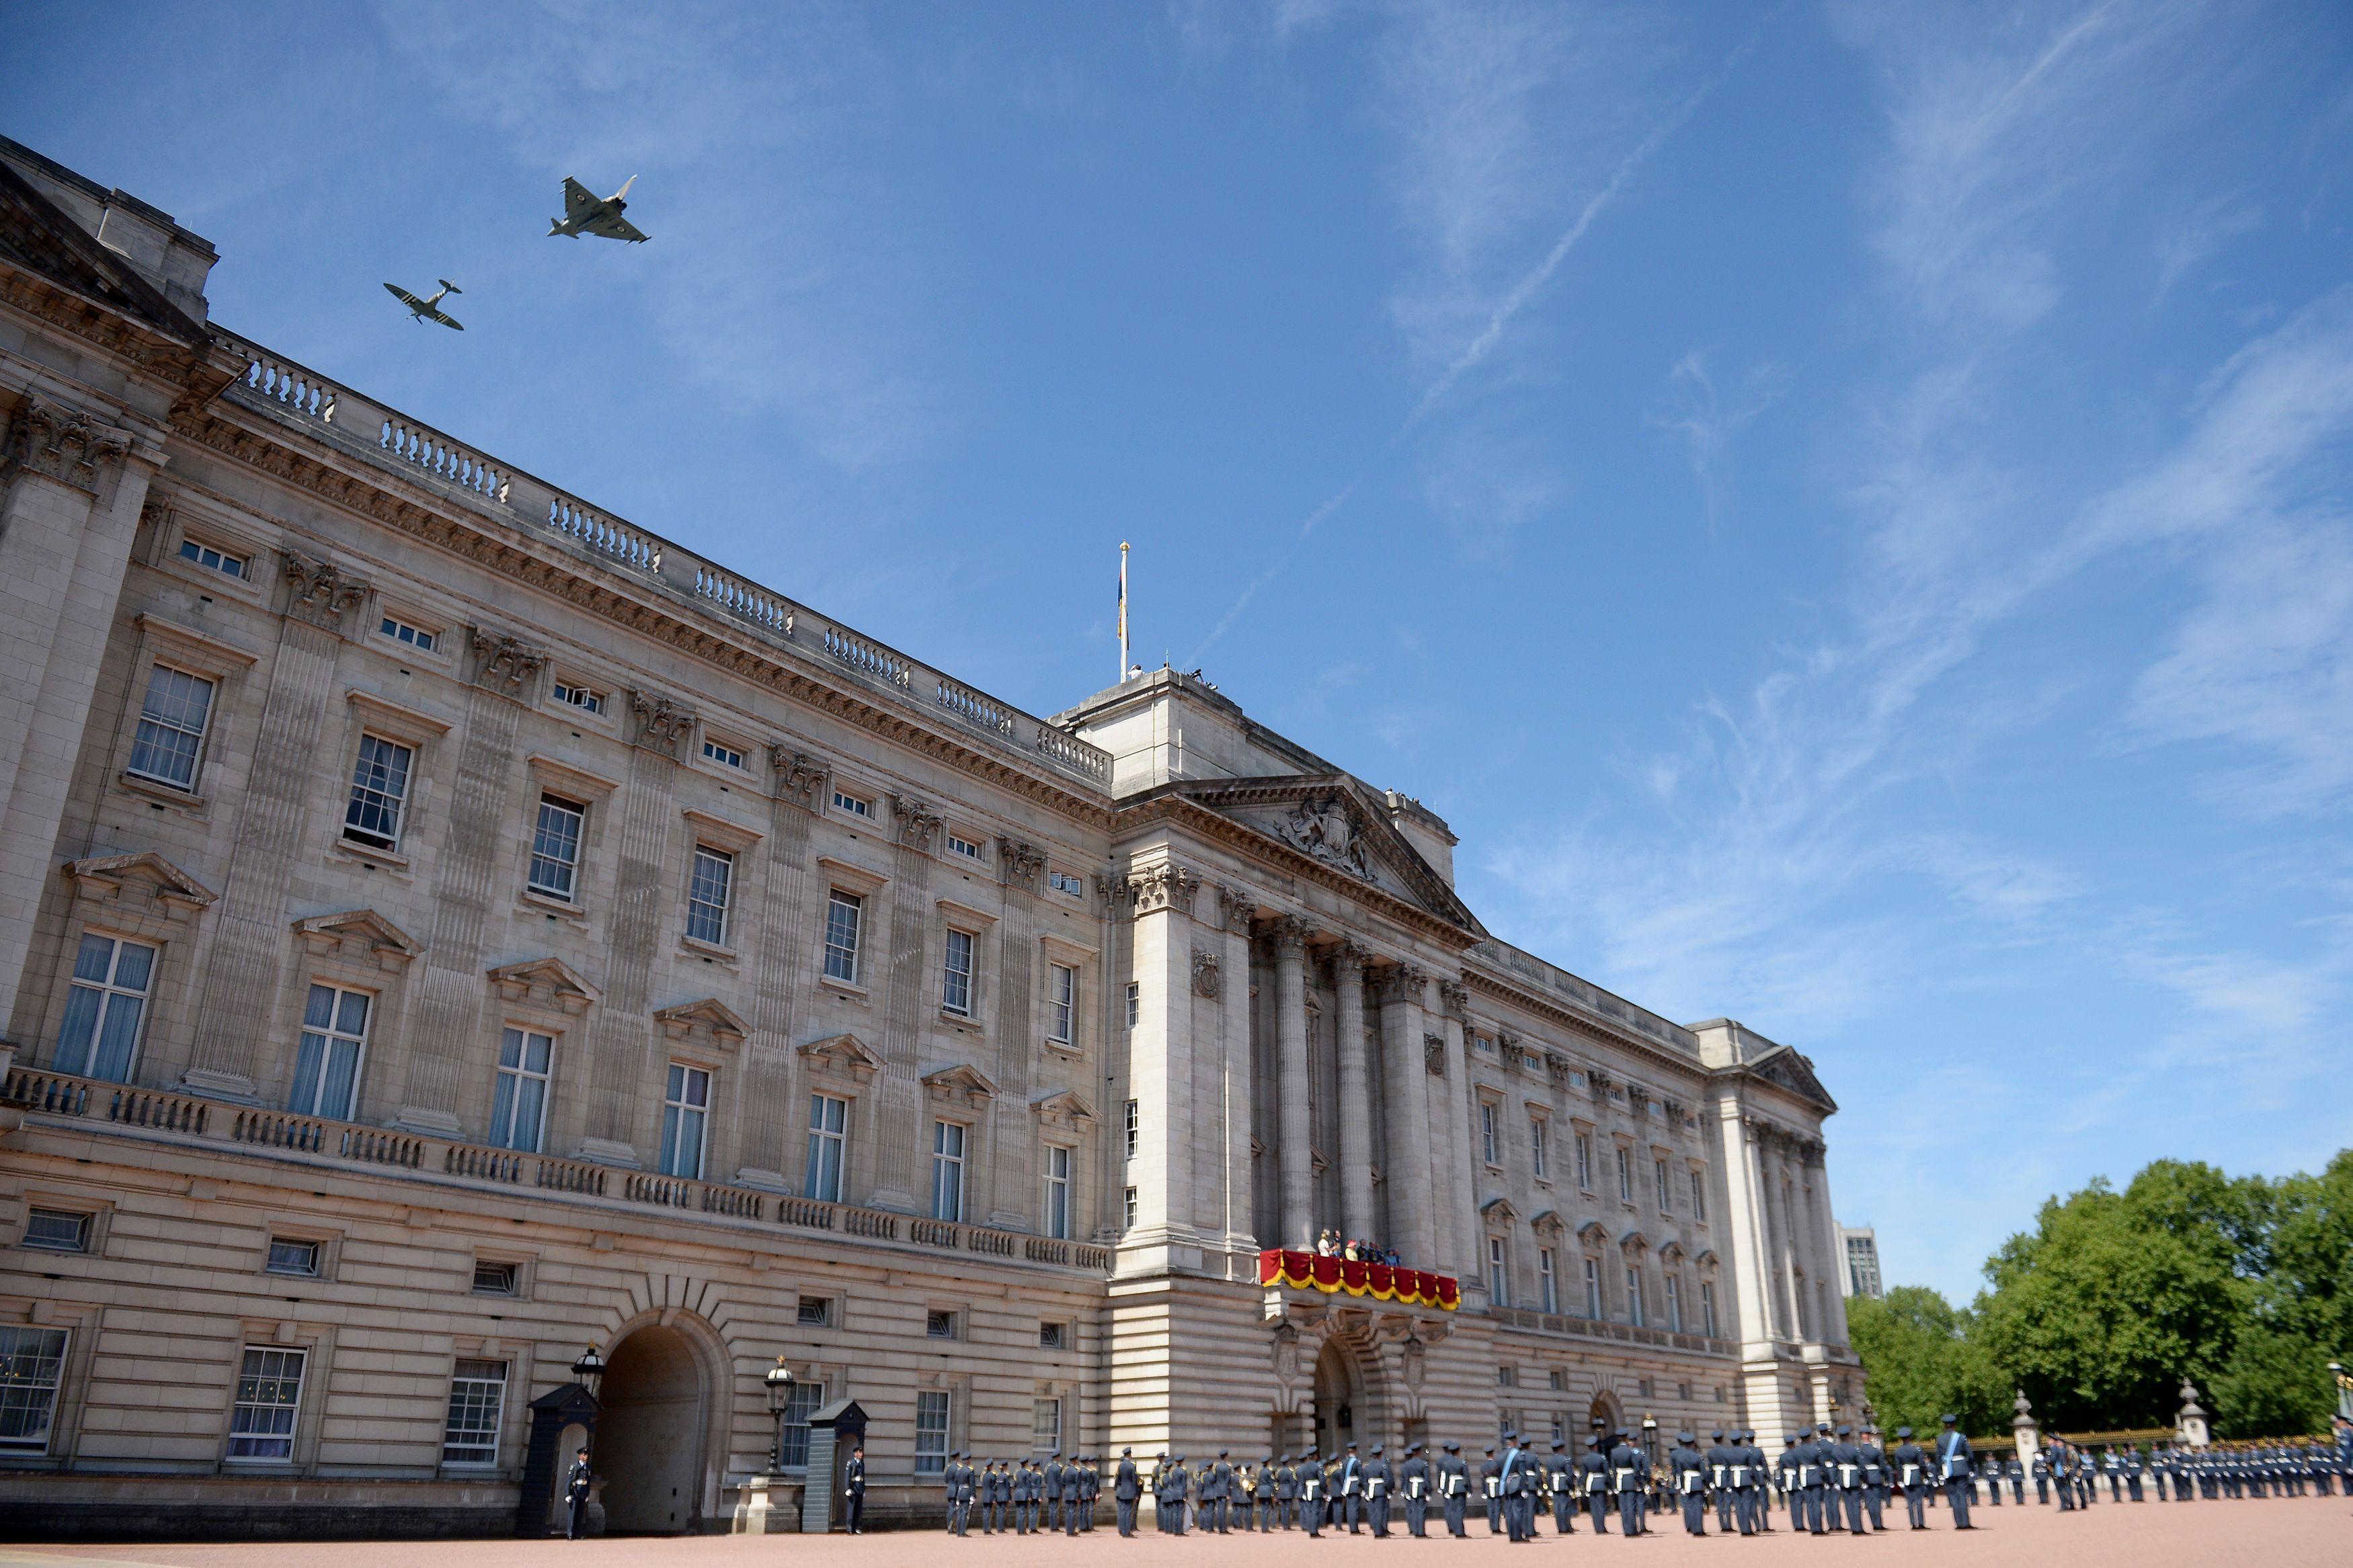 Buckingham Palace Ristrutturazione — Idealista/news #2362A8 3500 2333 Sala Da Pranzo Buckingham Palace